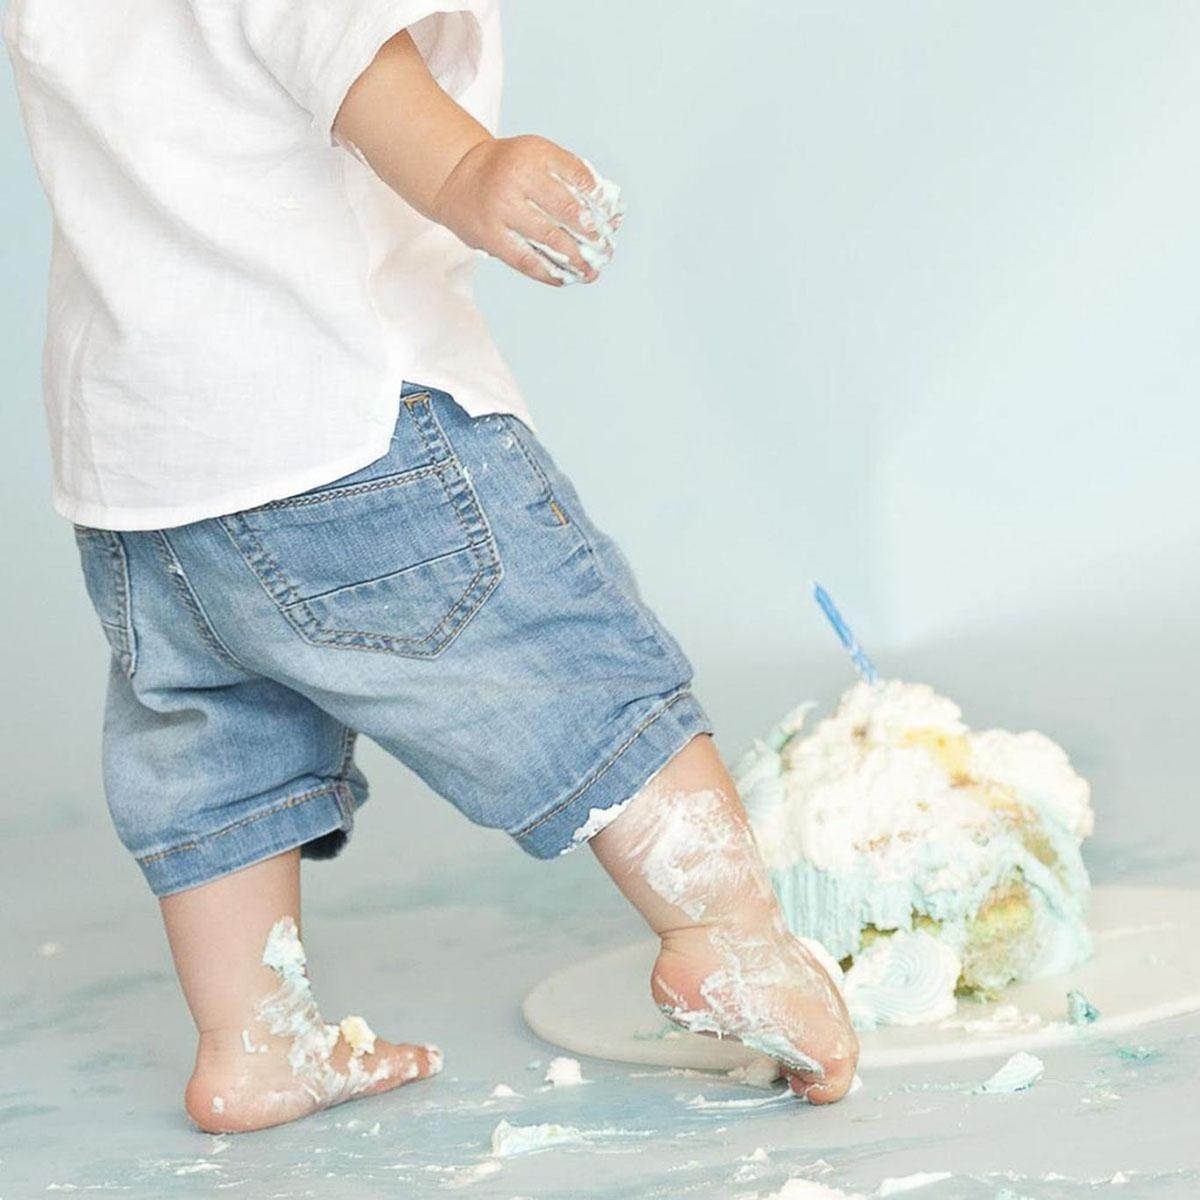 bambino tira calci a torta